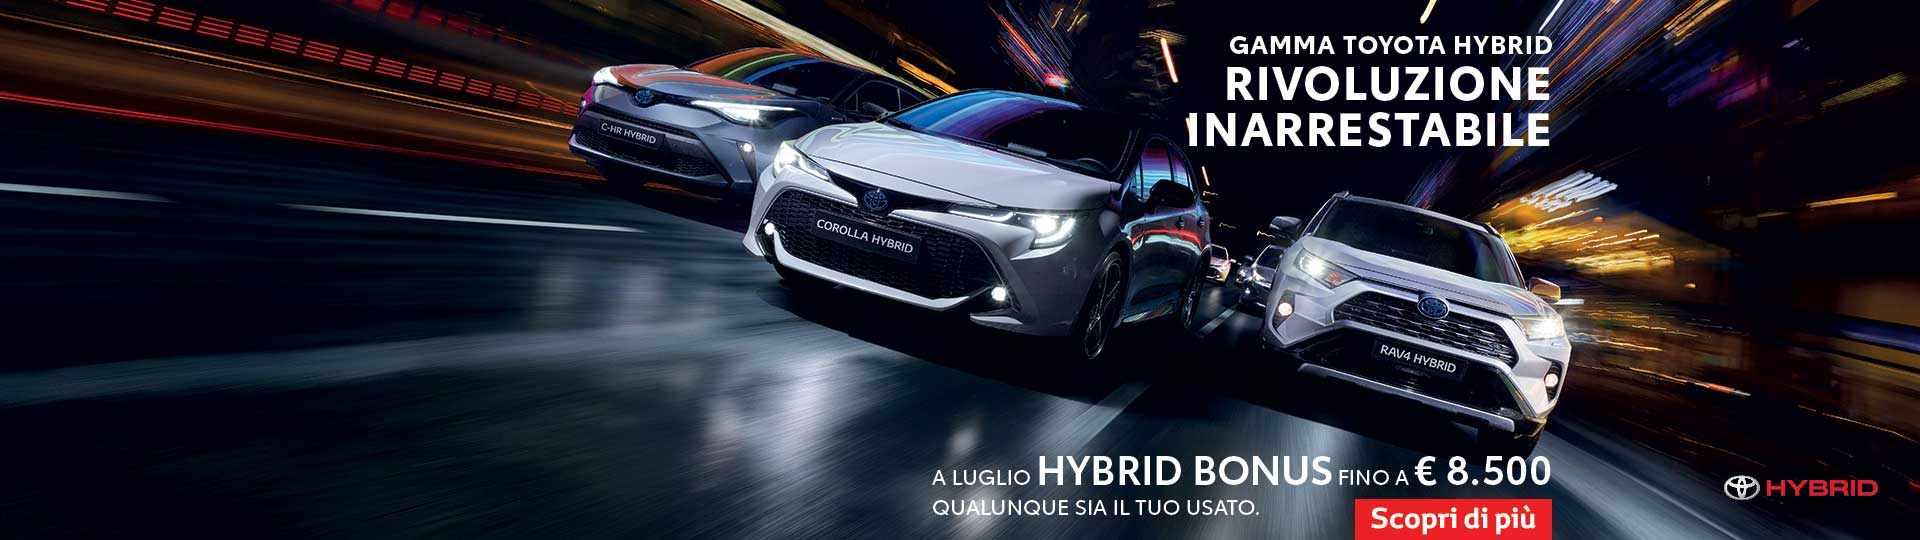 header_toyota_hybrid_bonus_gamma_luglio_2020.jpg